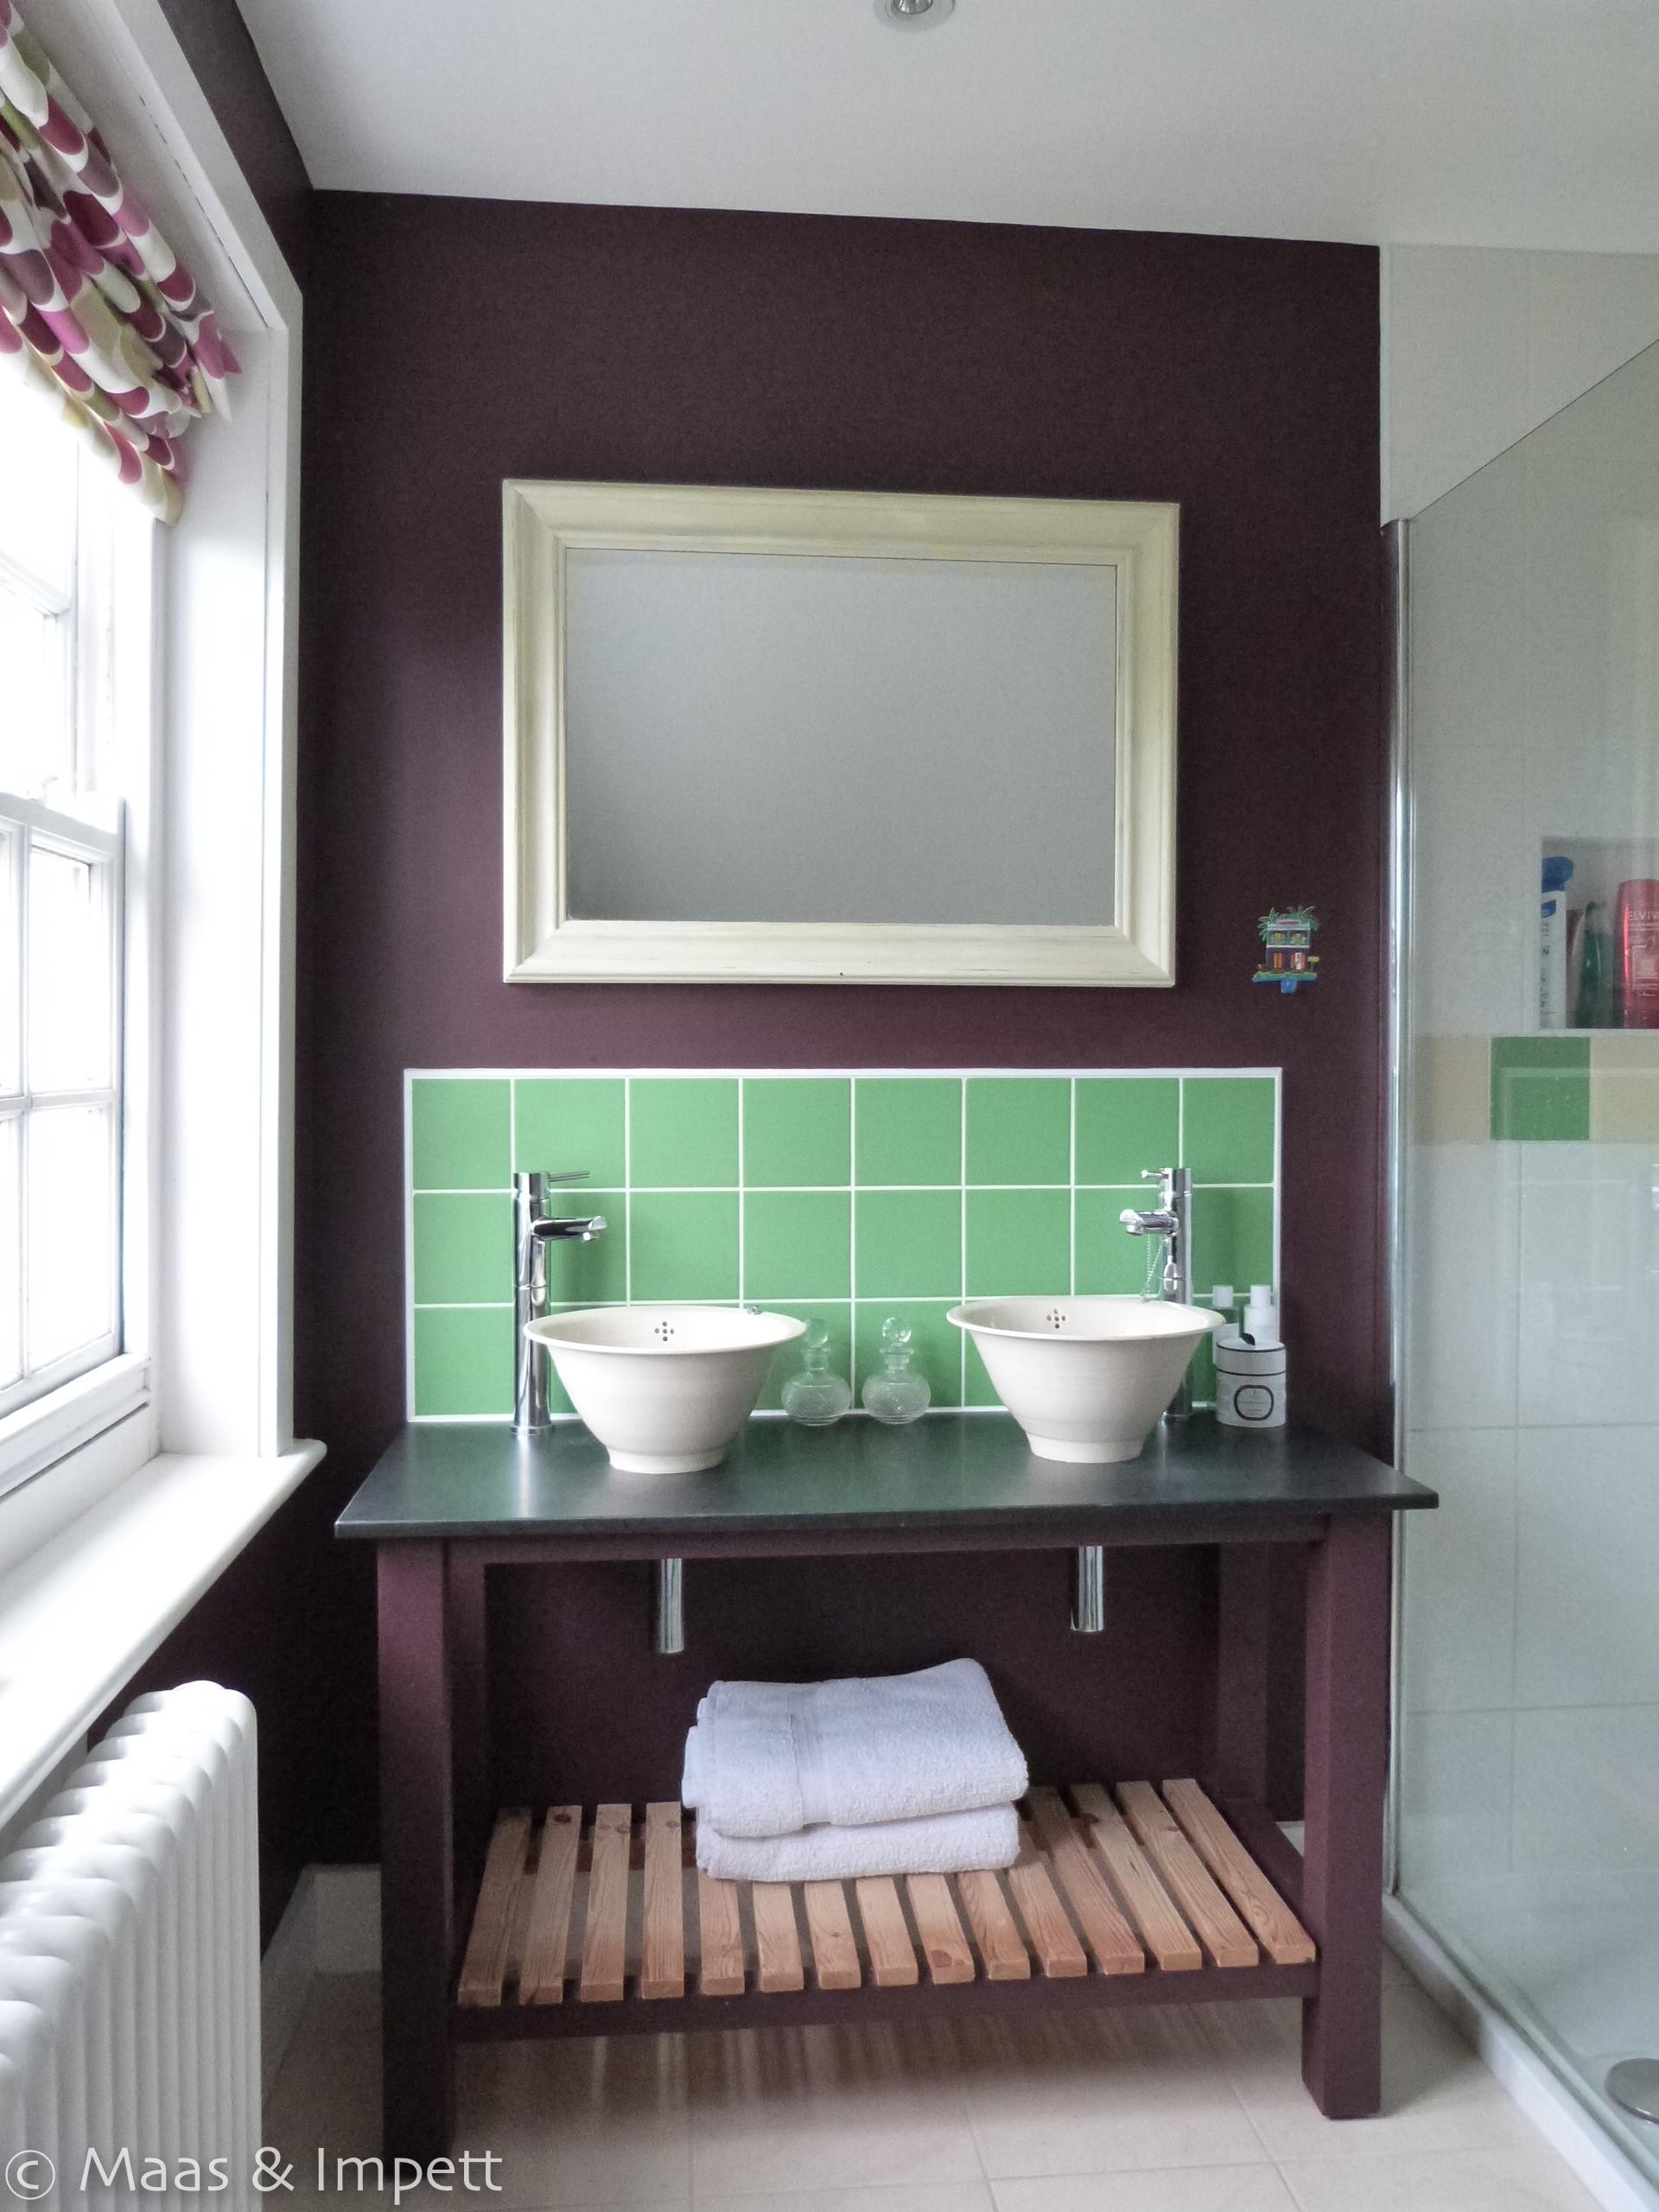 Washstand with ceramic sinks